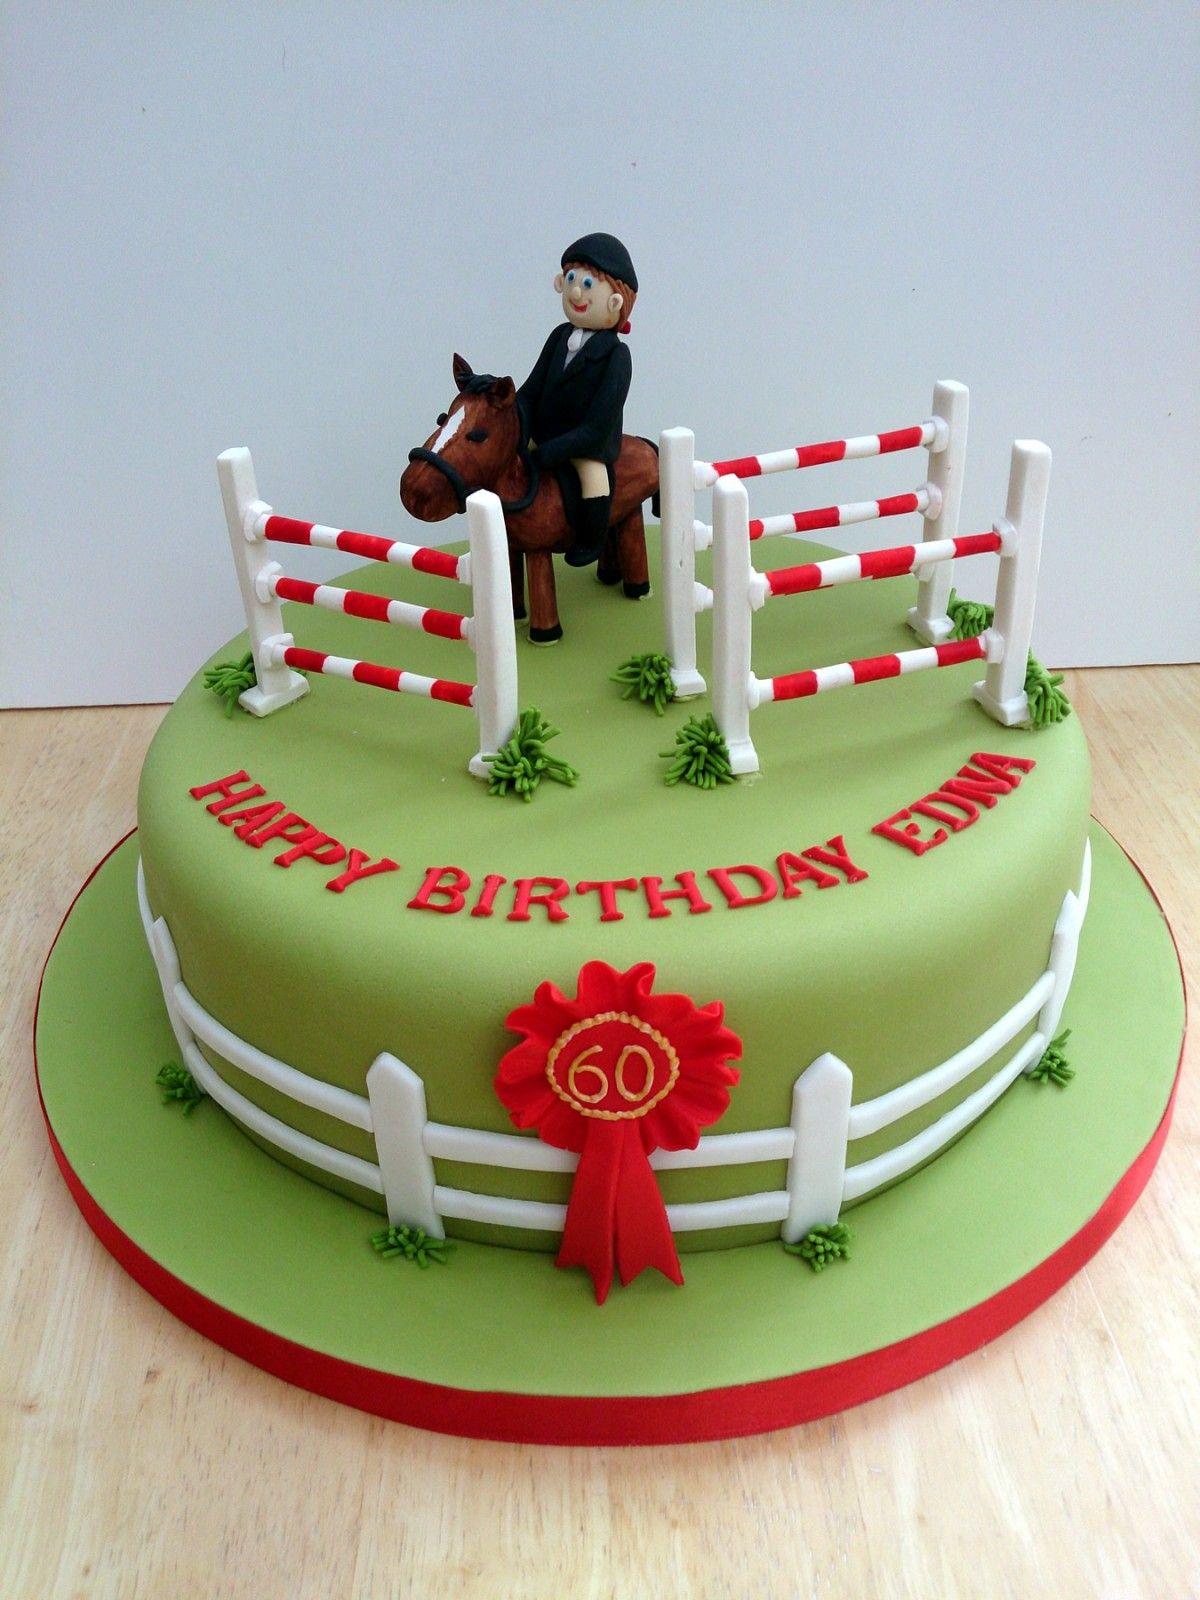 Show Jumping Themed Novelty Birthday Cake